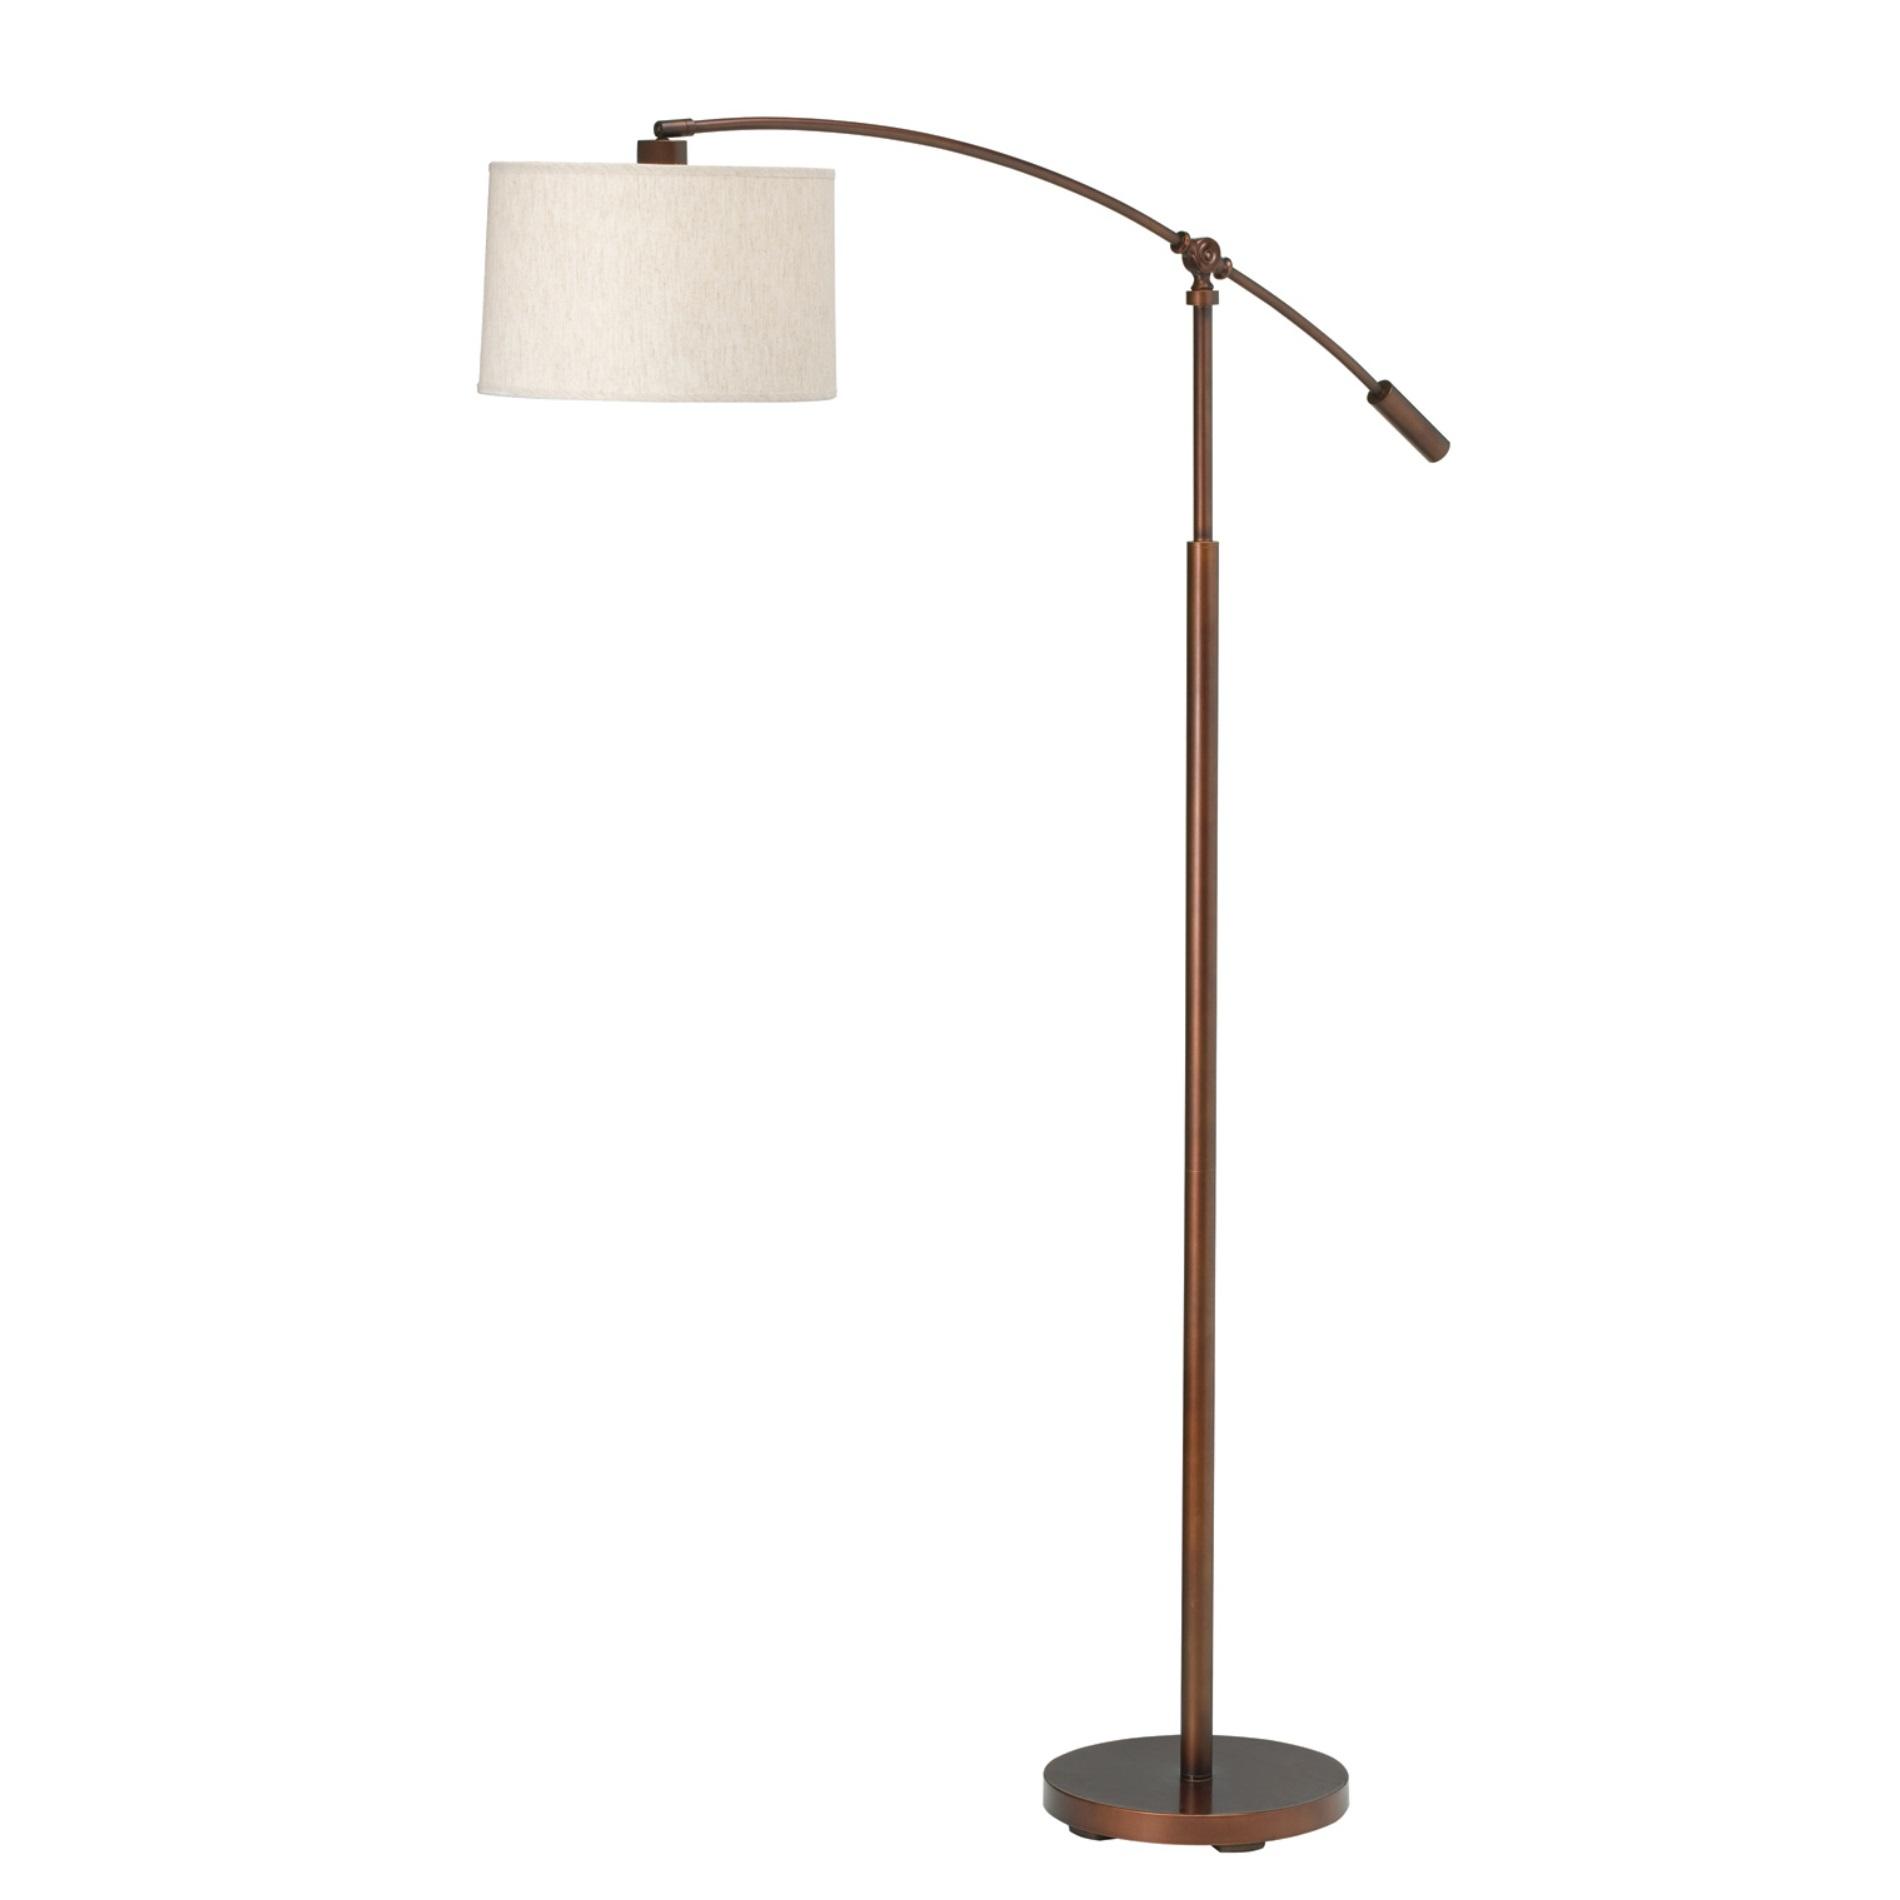 Kichler Cantilever Floor Lamp In Burnish Copper Bronze L Brilliant Source Lighting